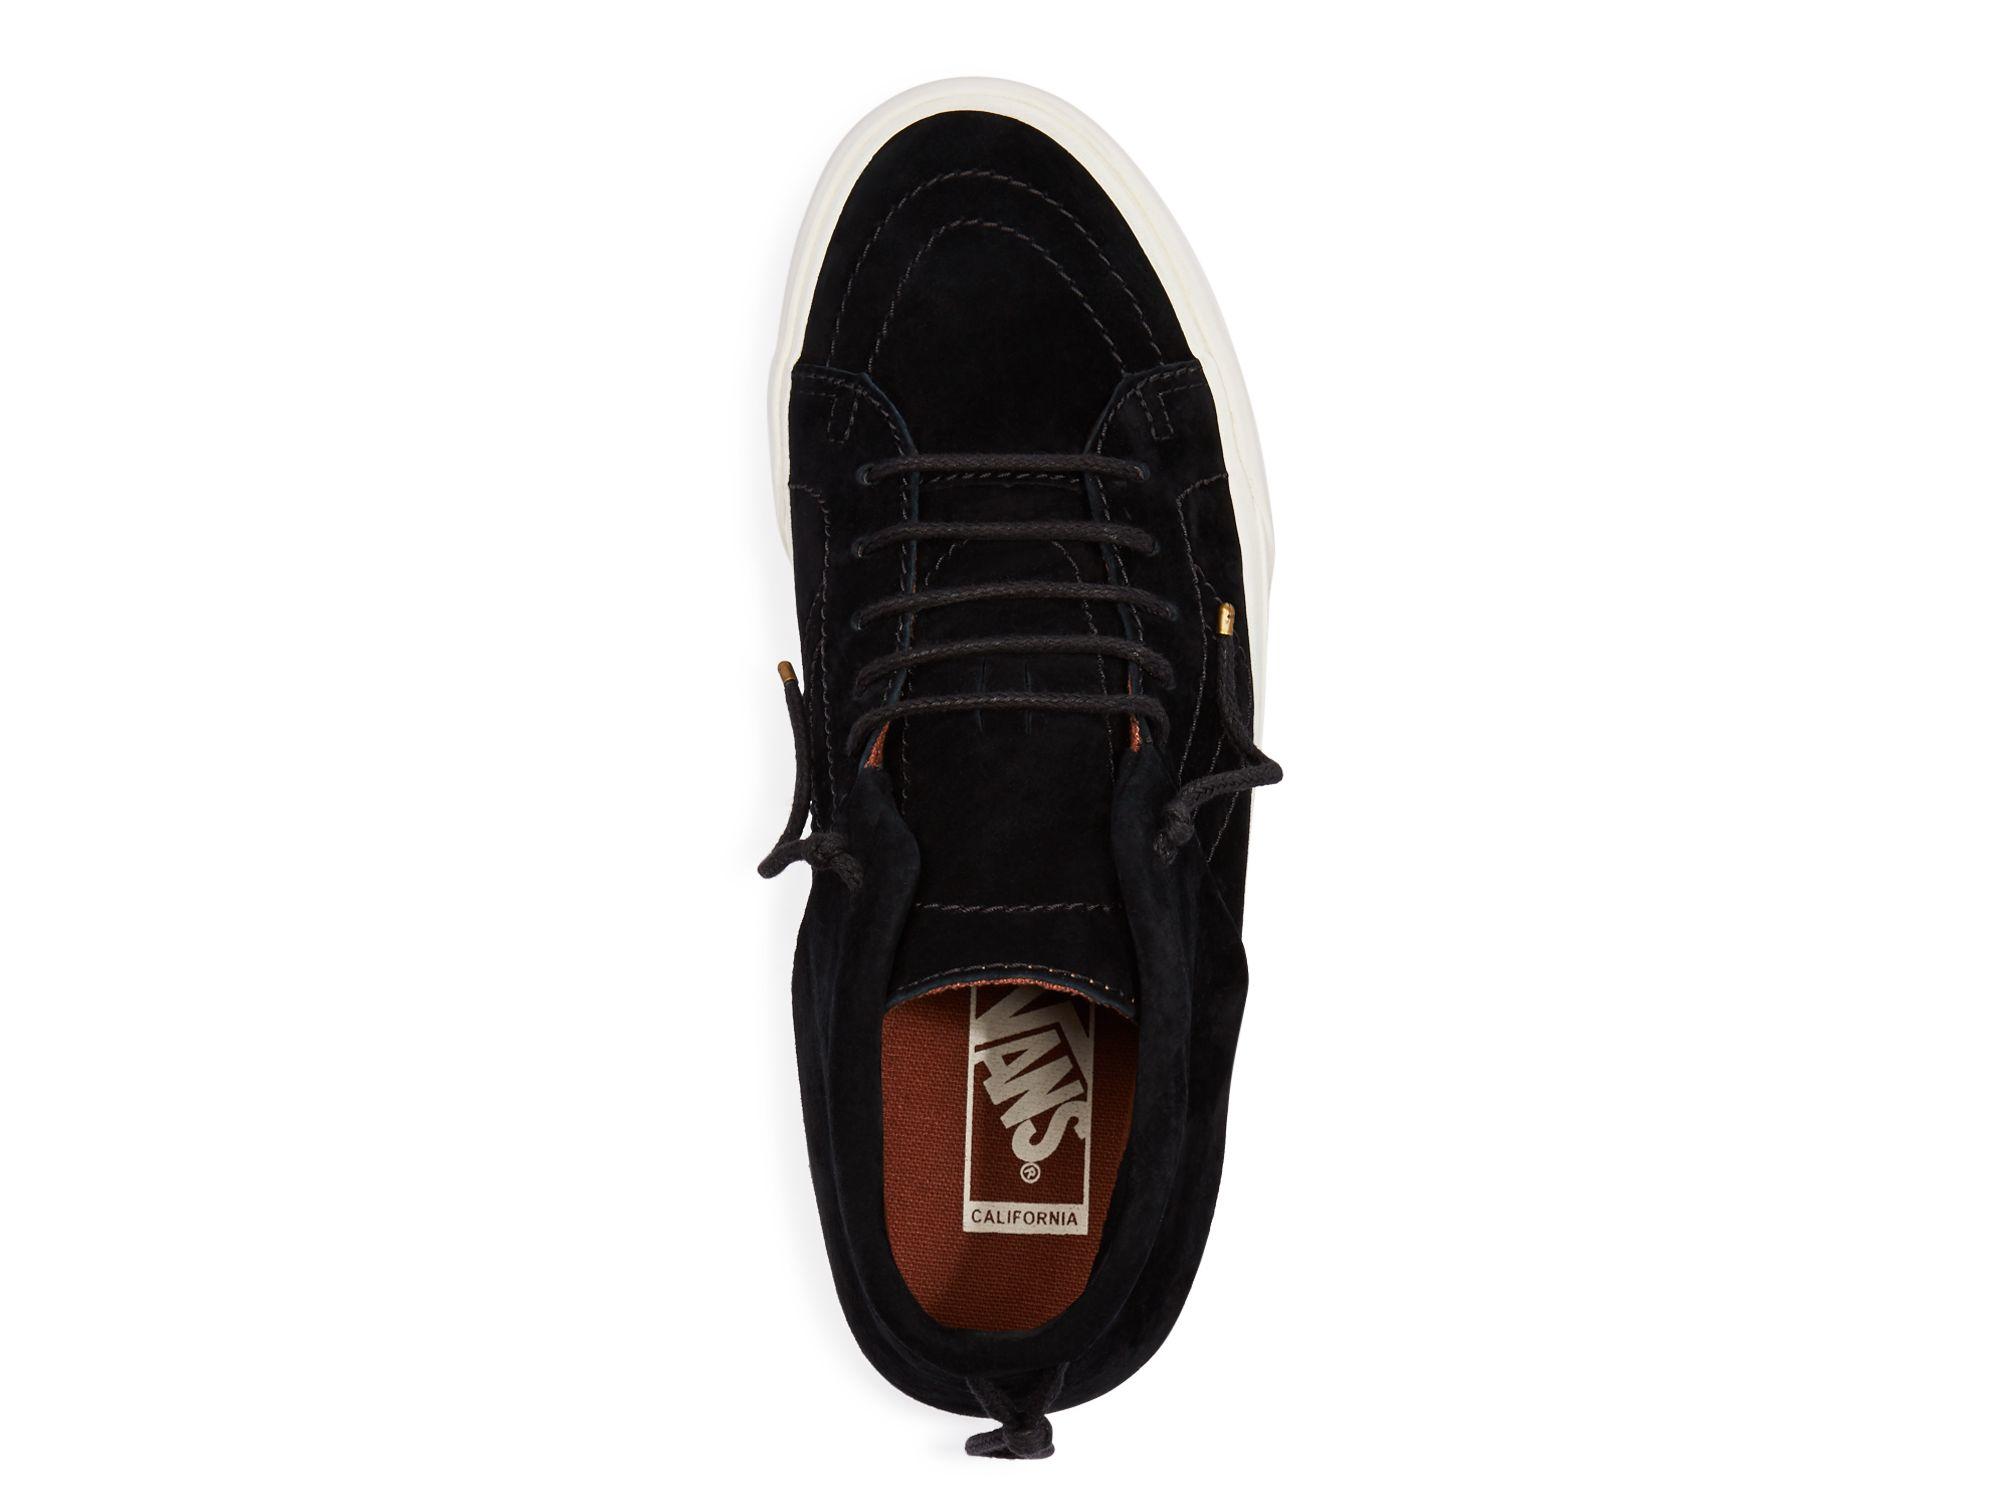 783727d4b2421a Lyst - Vans Sk8-mid Moc Ca Sneakers in Black for Men